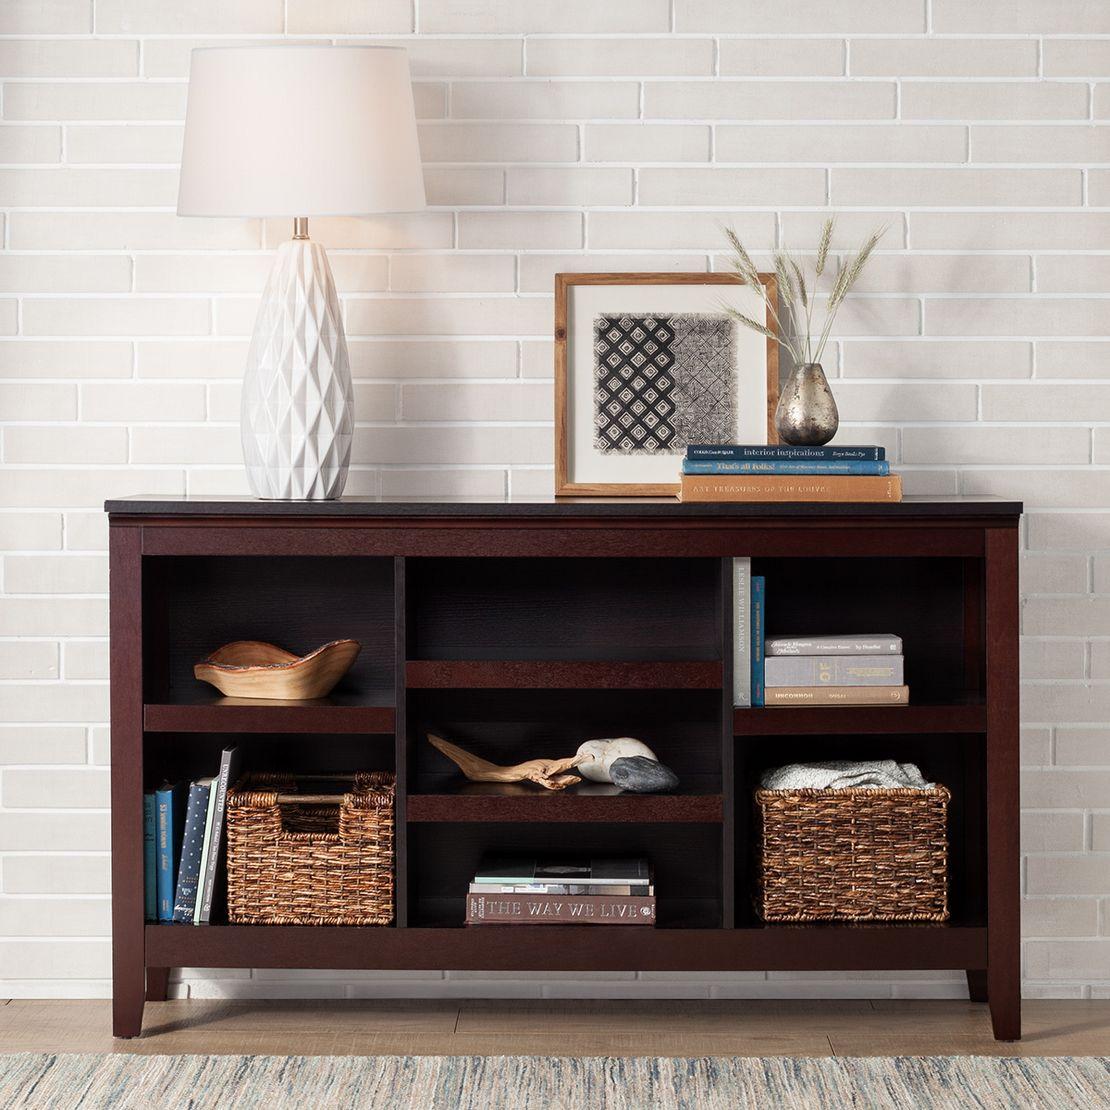 Furniture In Target: Home Office Furniture : Target